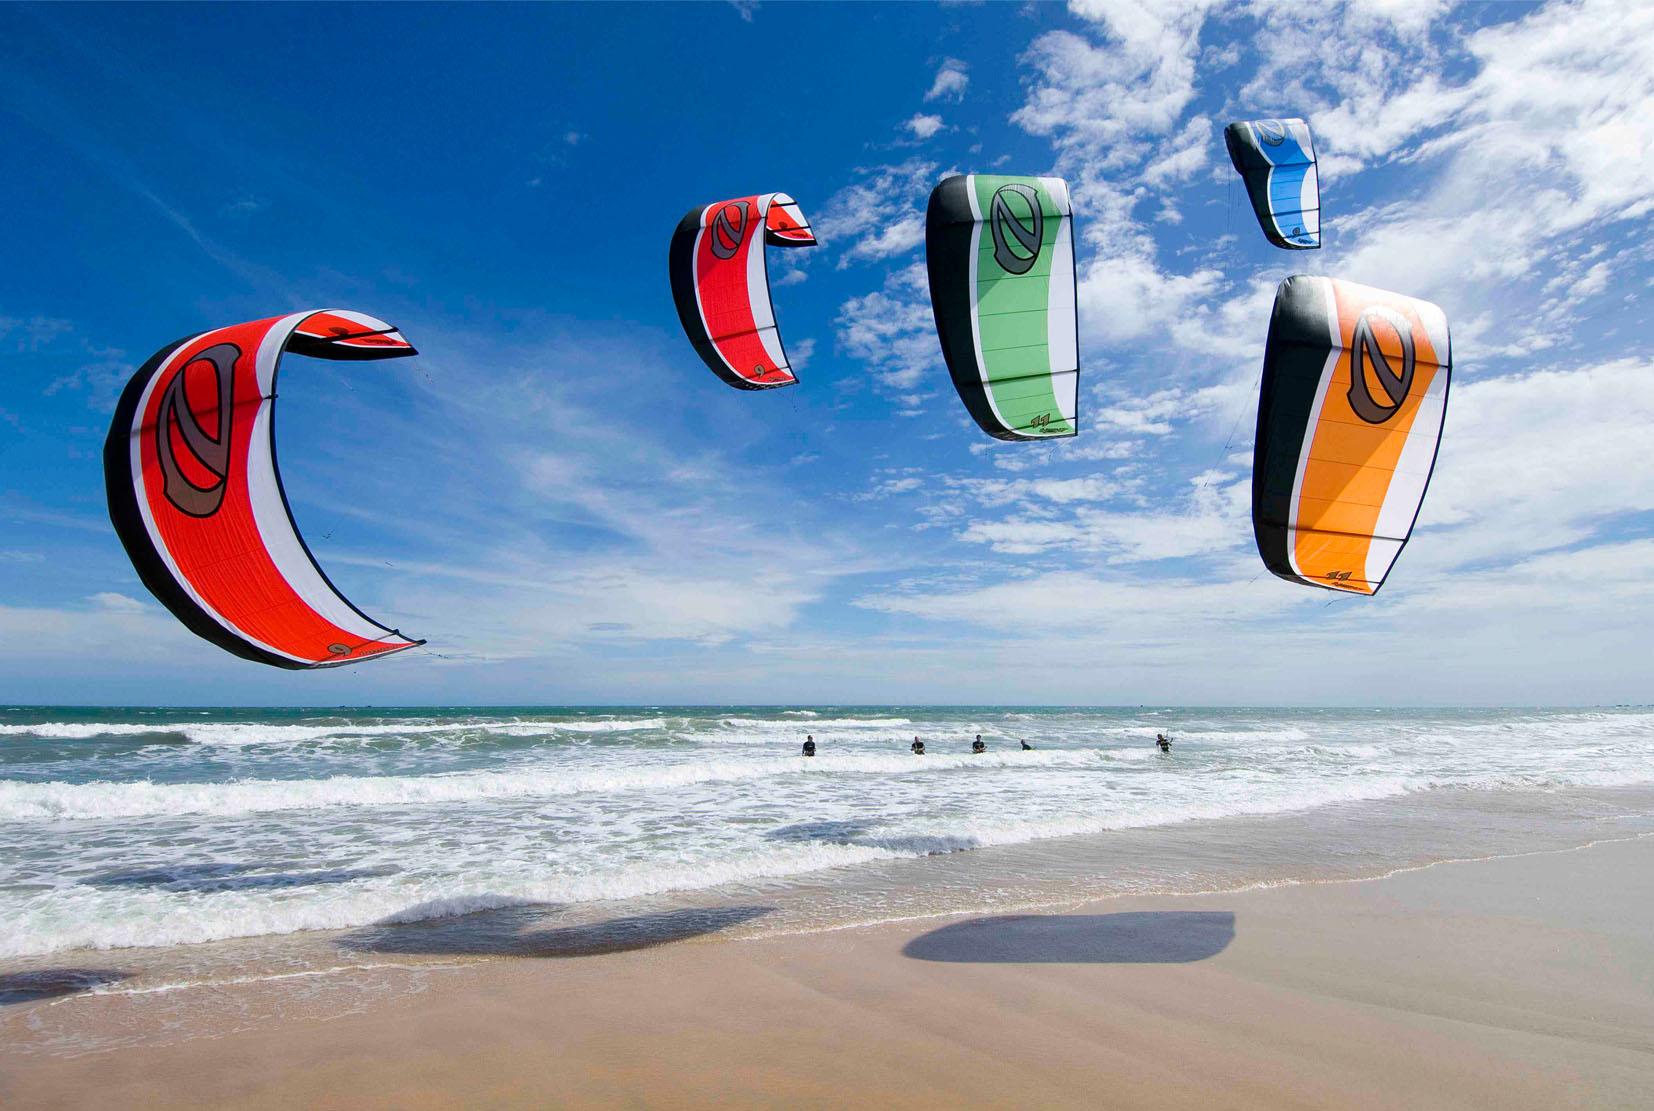 kite-surf-turismo-sportivo-trapani